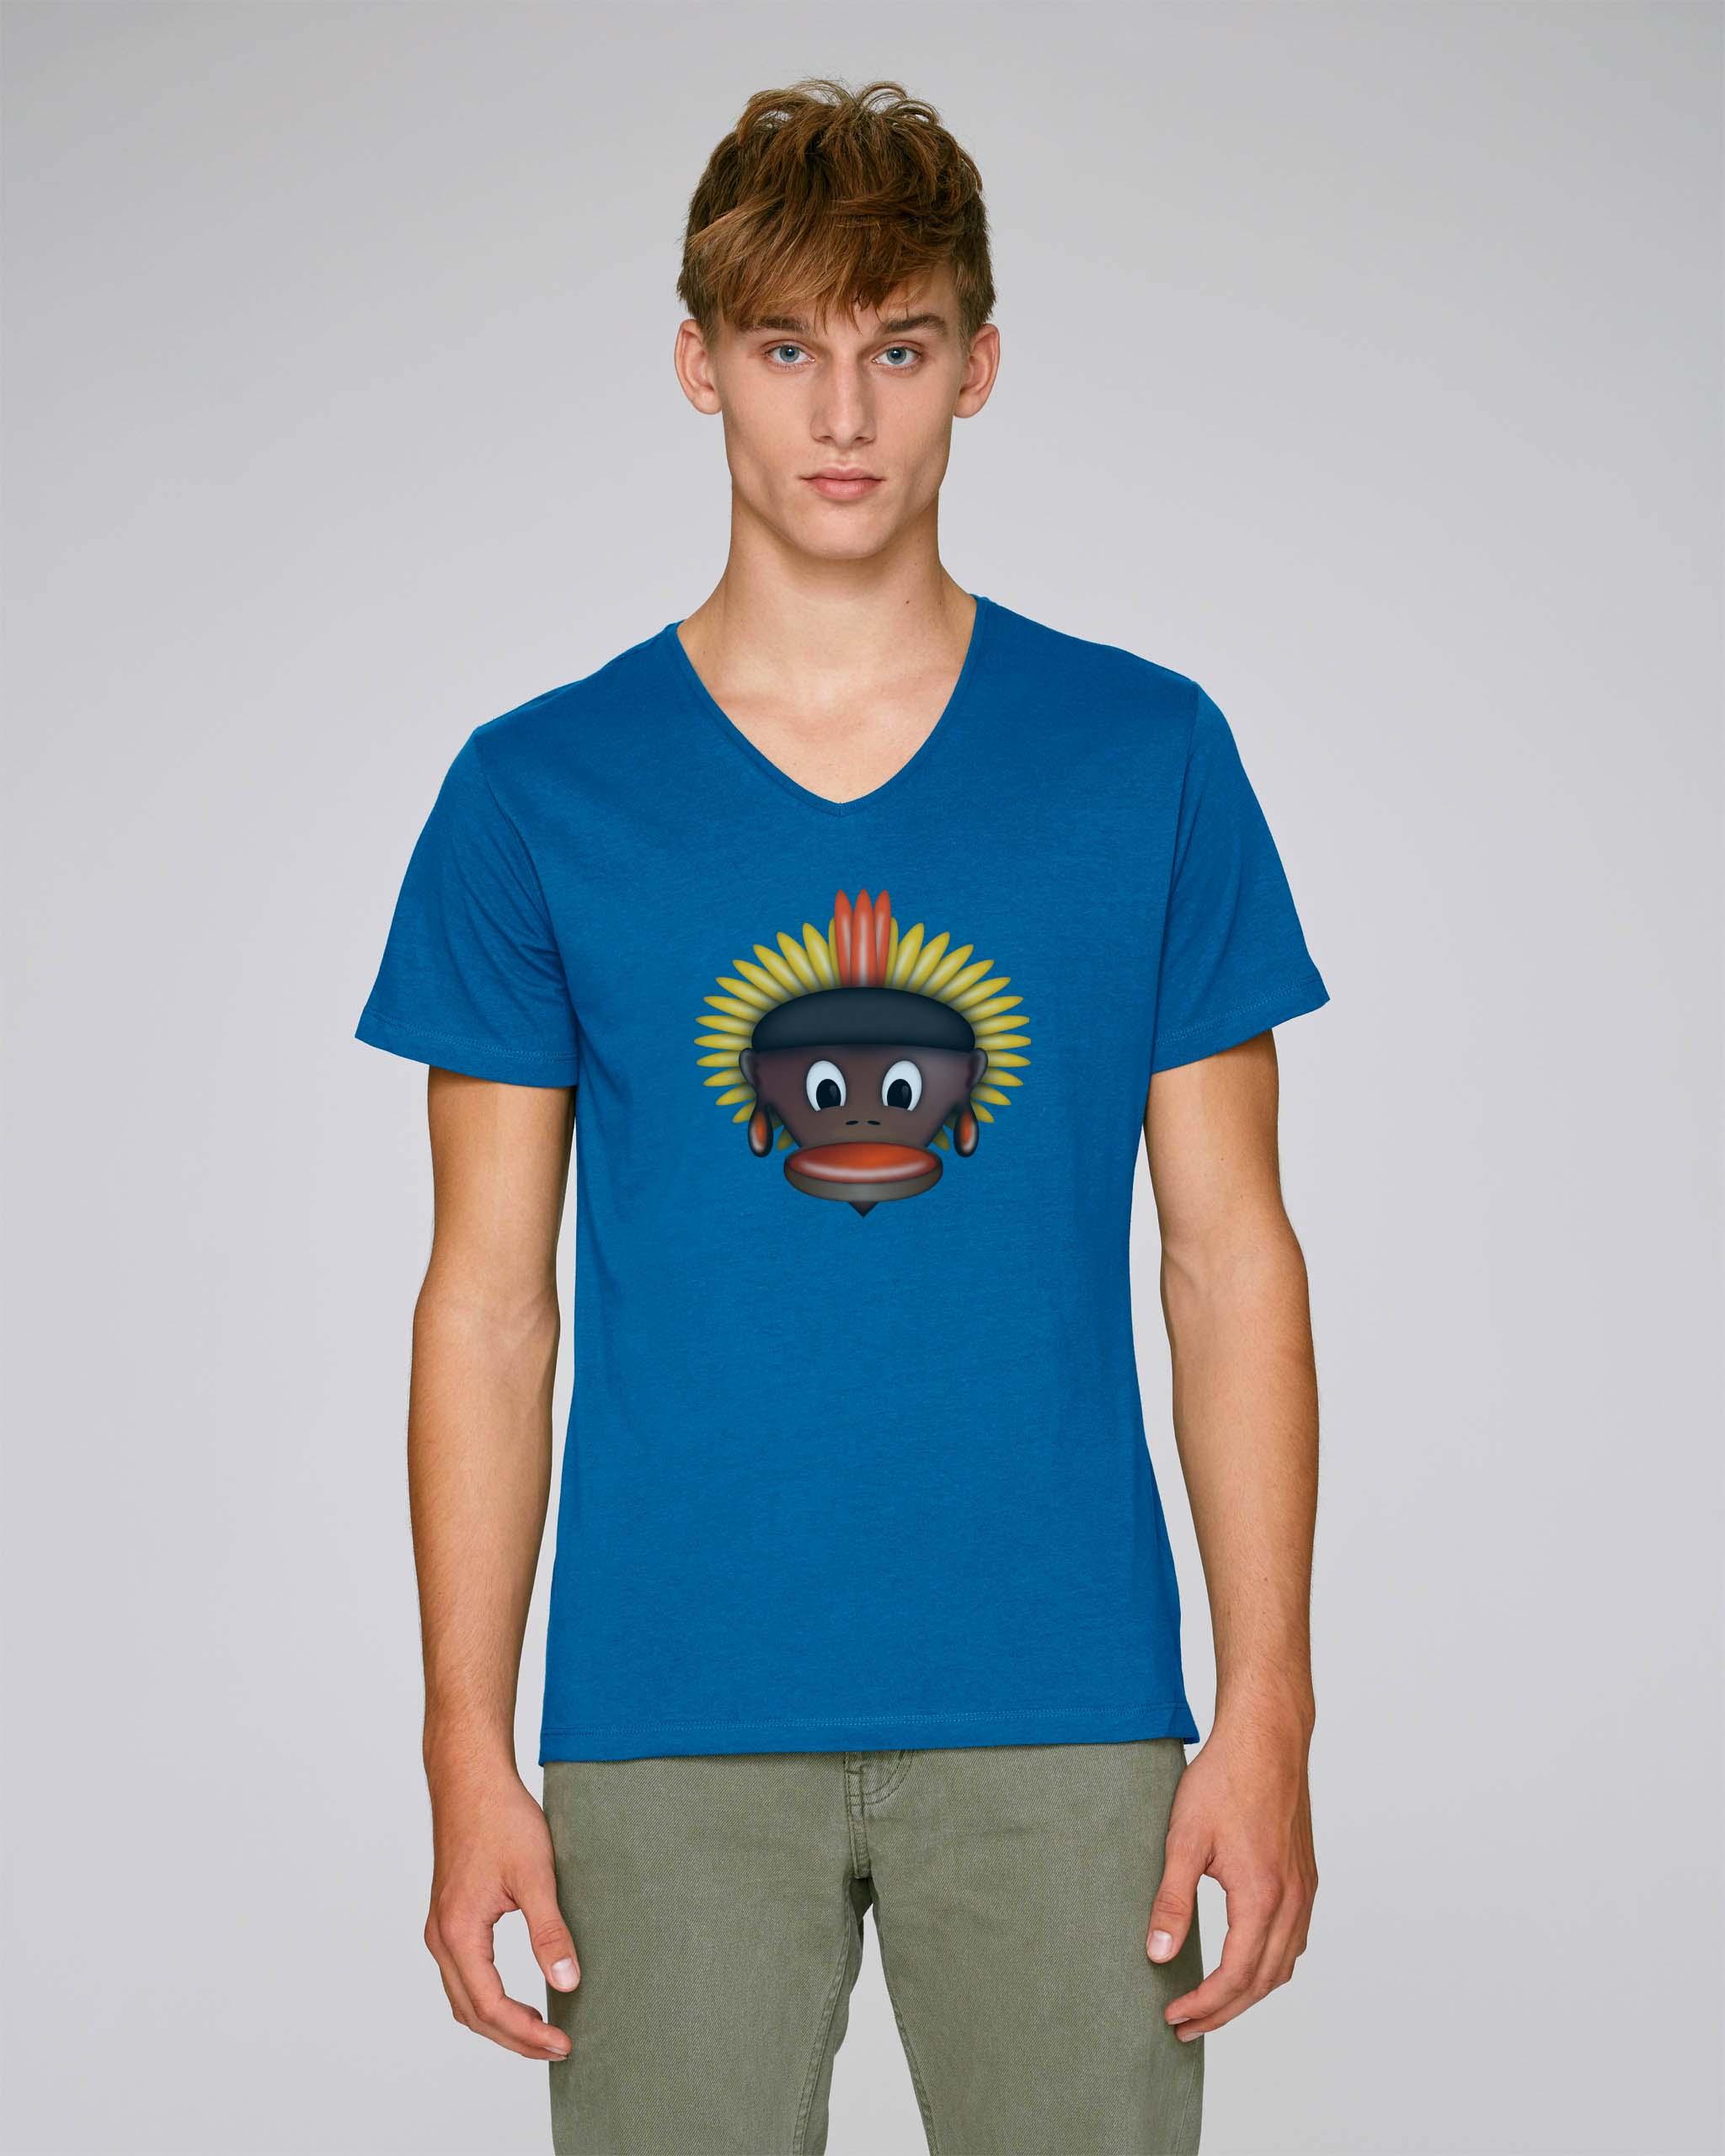 T-Shirt Bleu Bio Homme - Tribe tee